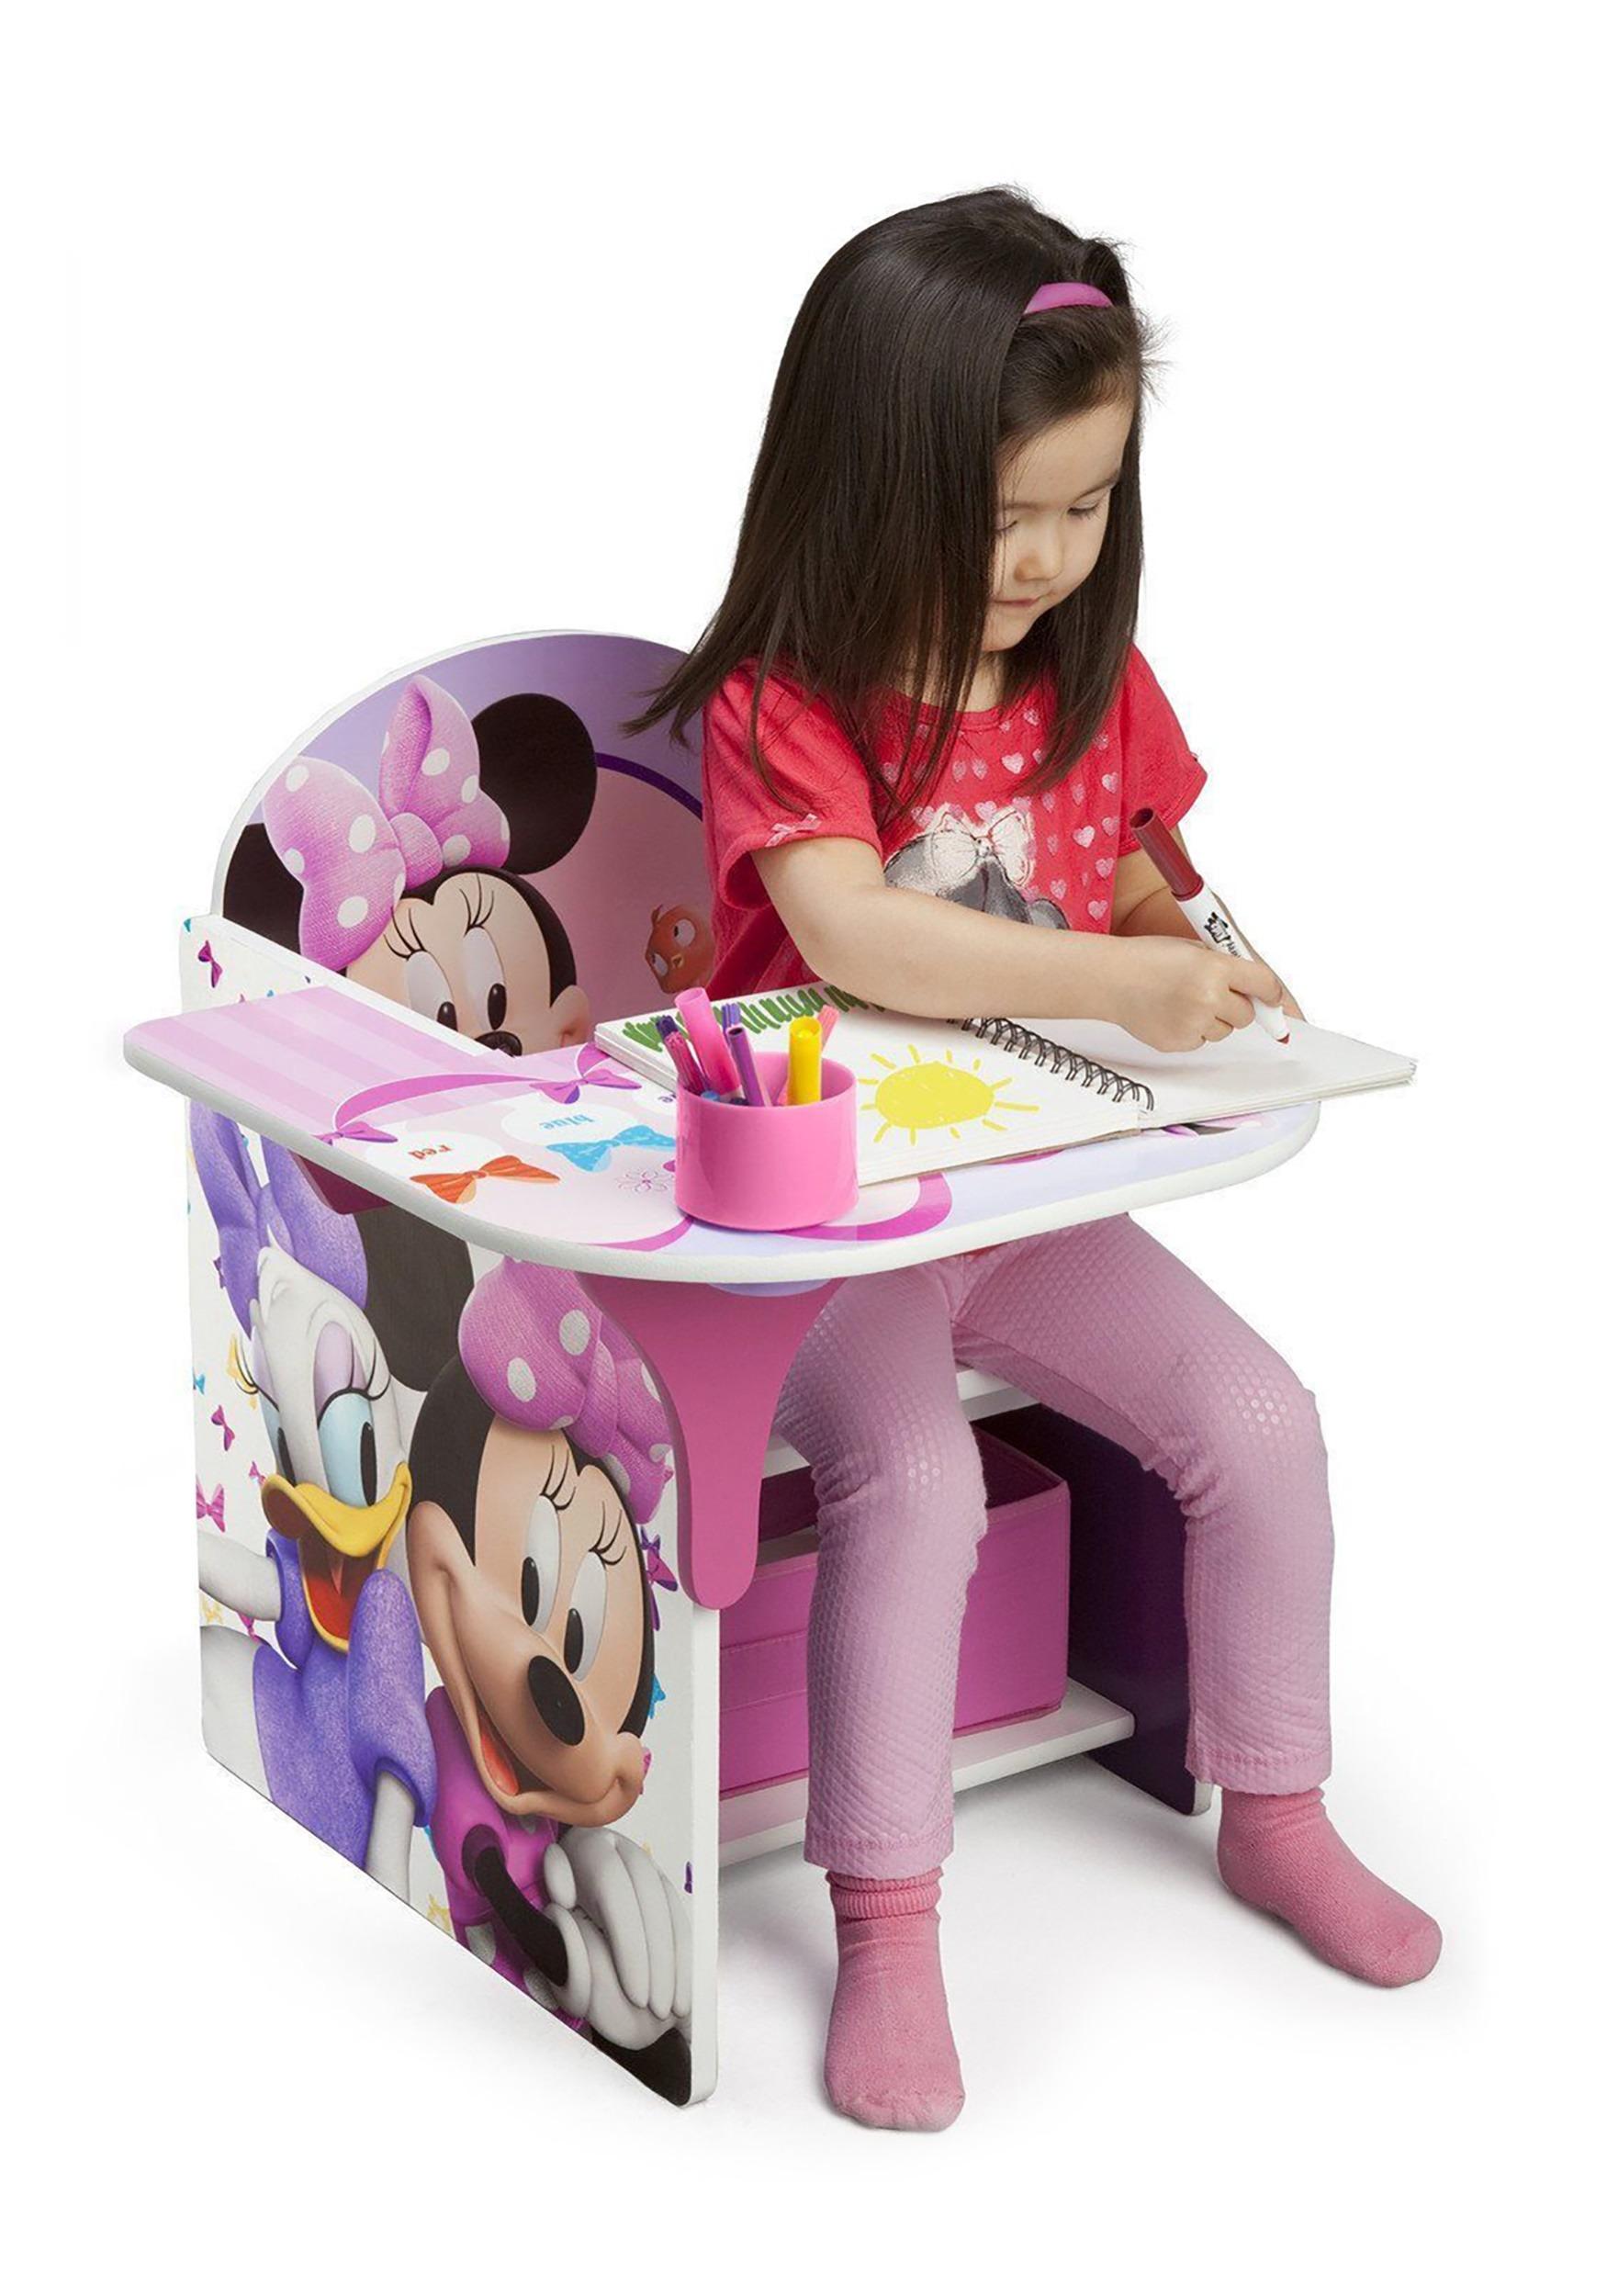 Superieur Minnie Mouse Chair Desk With Storage Bin